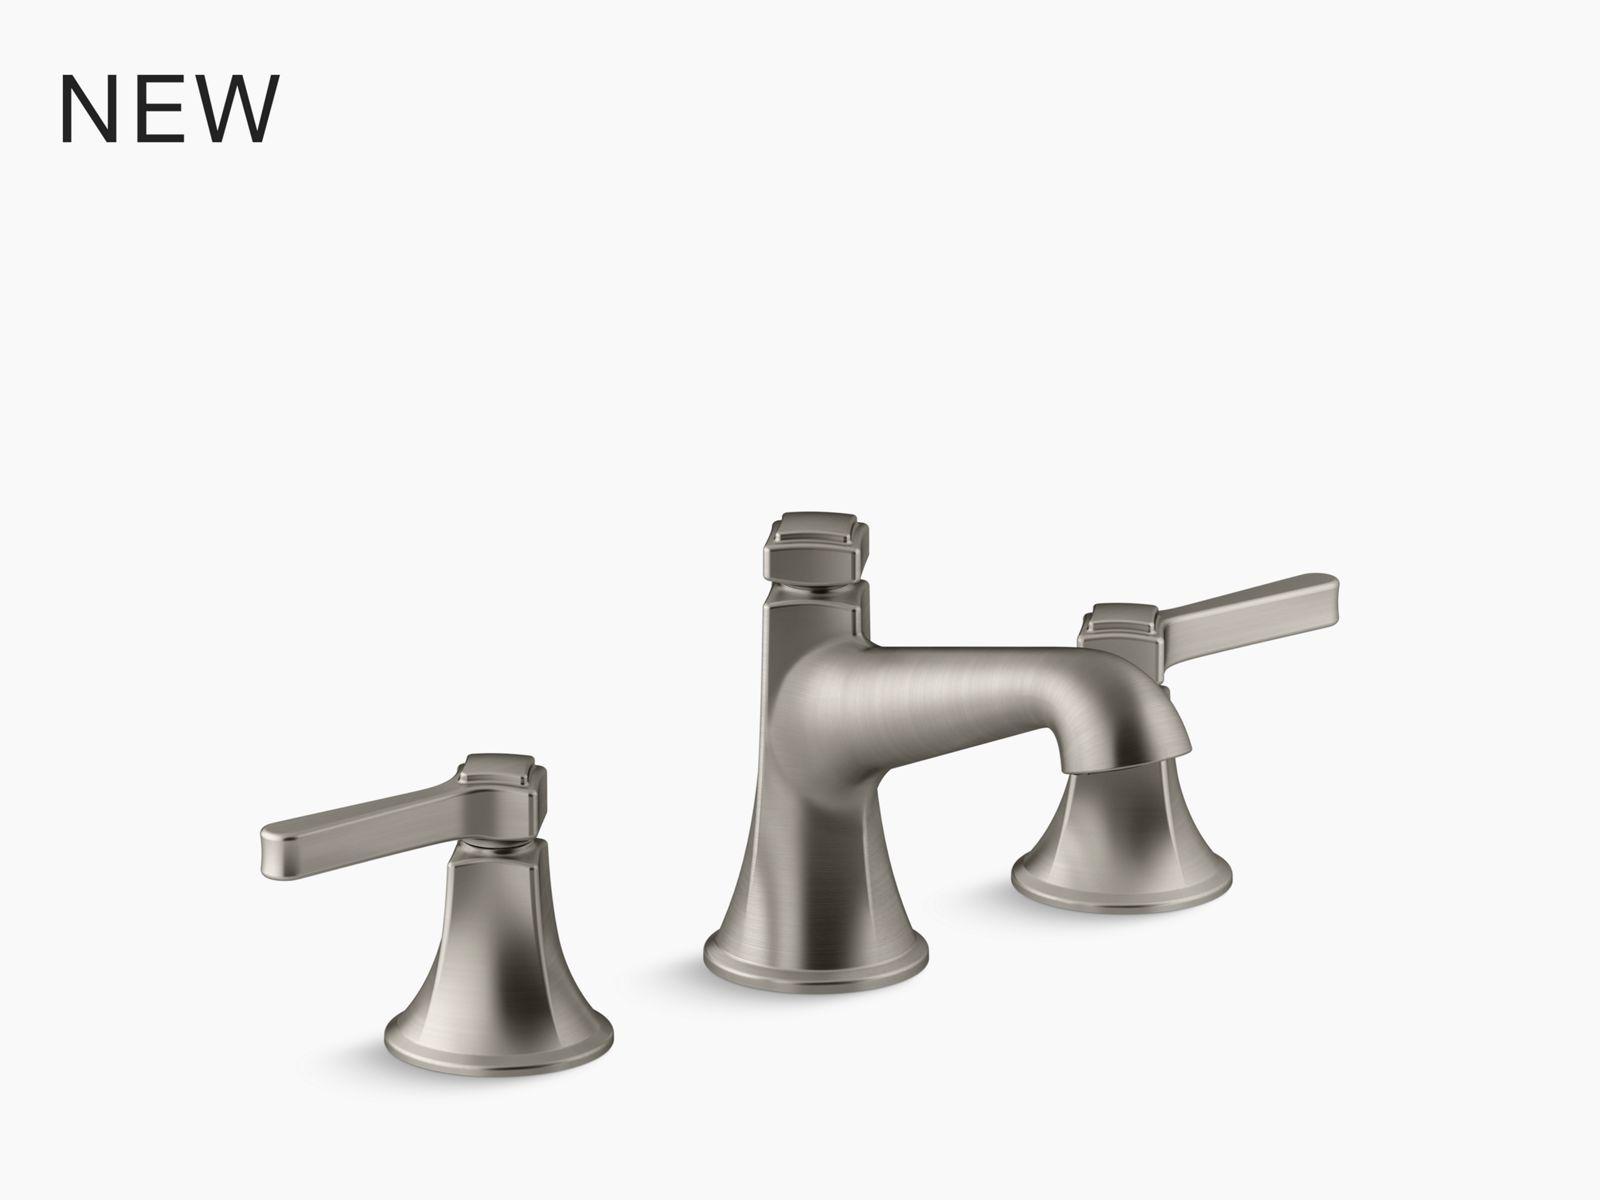 K77515  Tournant semiprofessional kitchen sink faucet